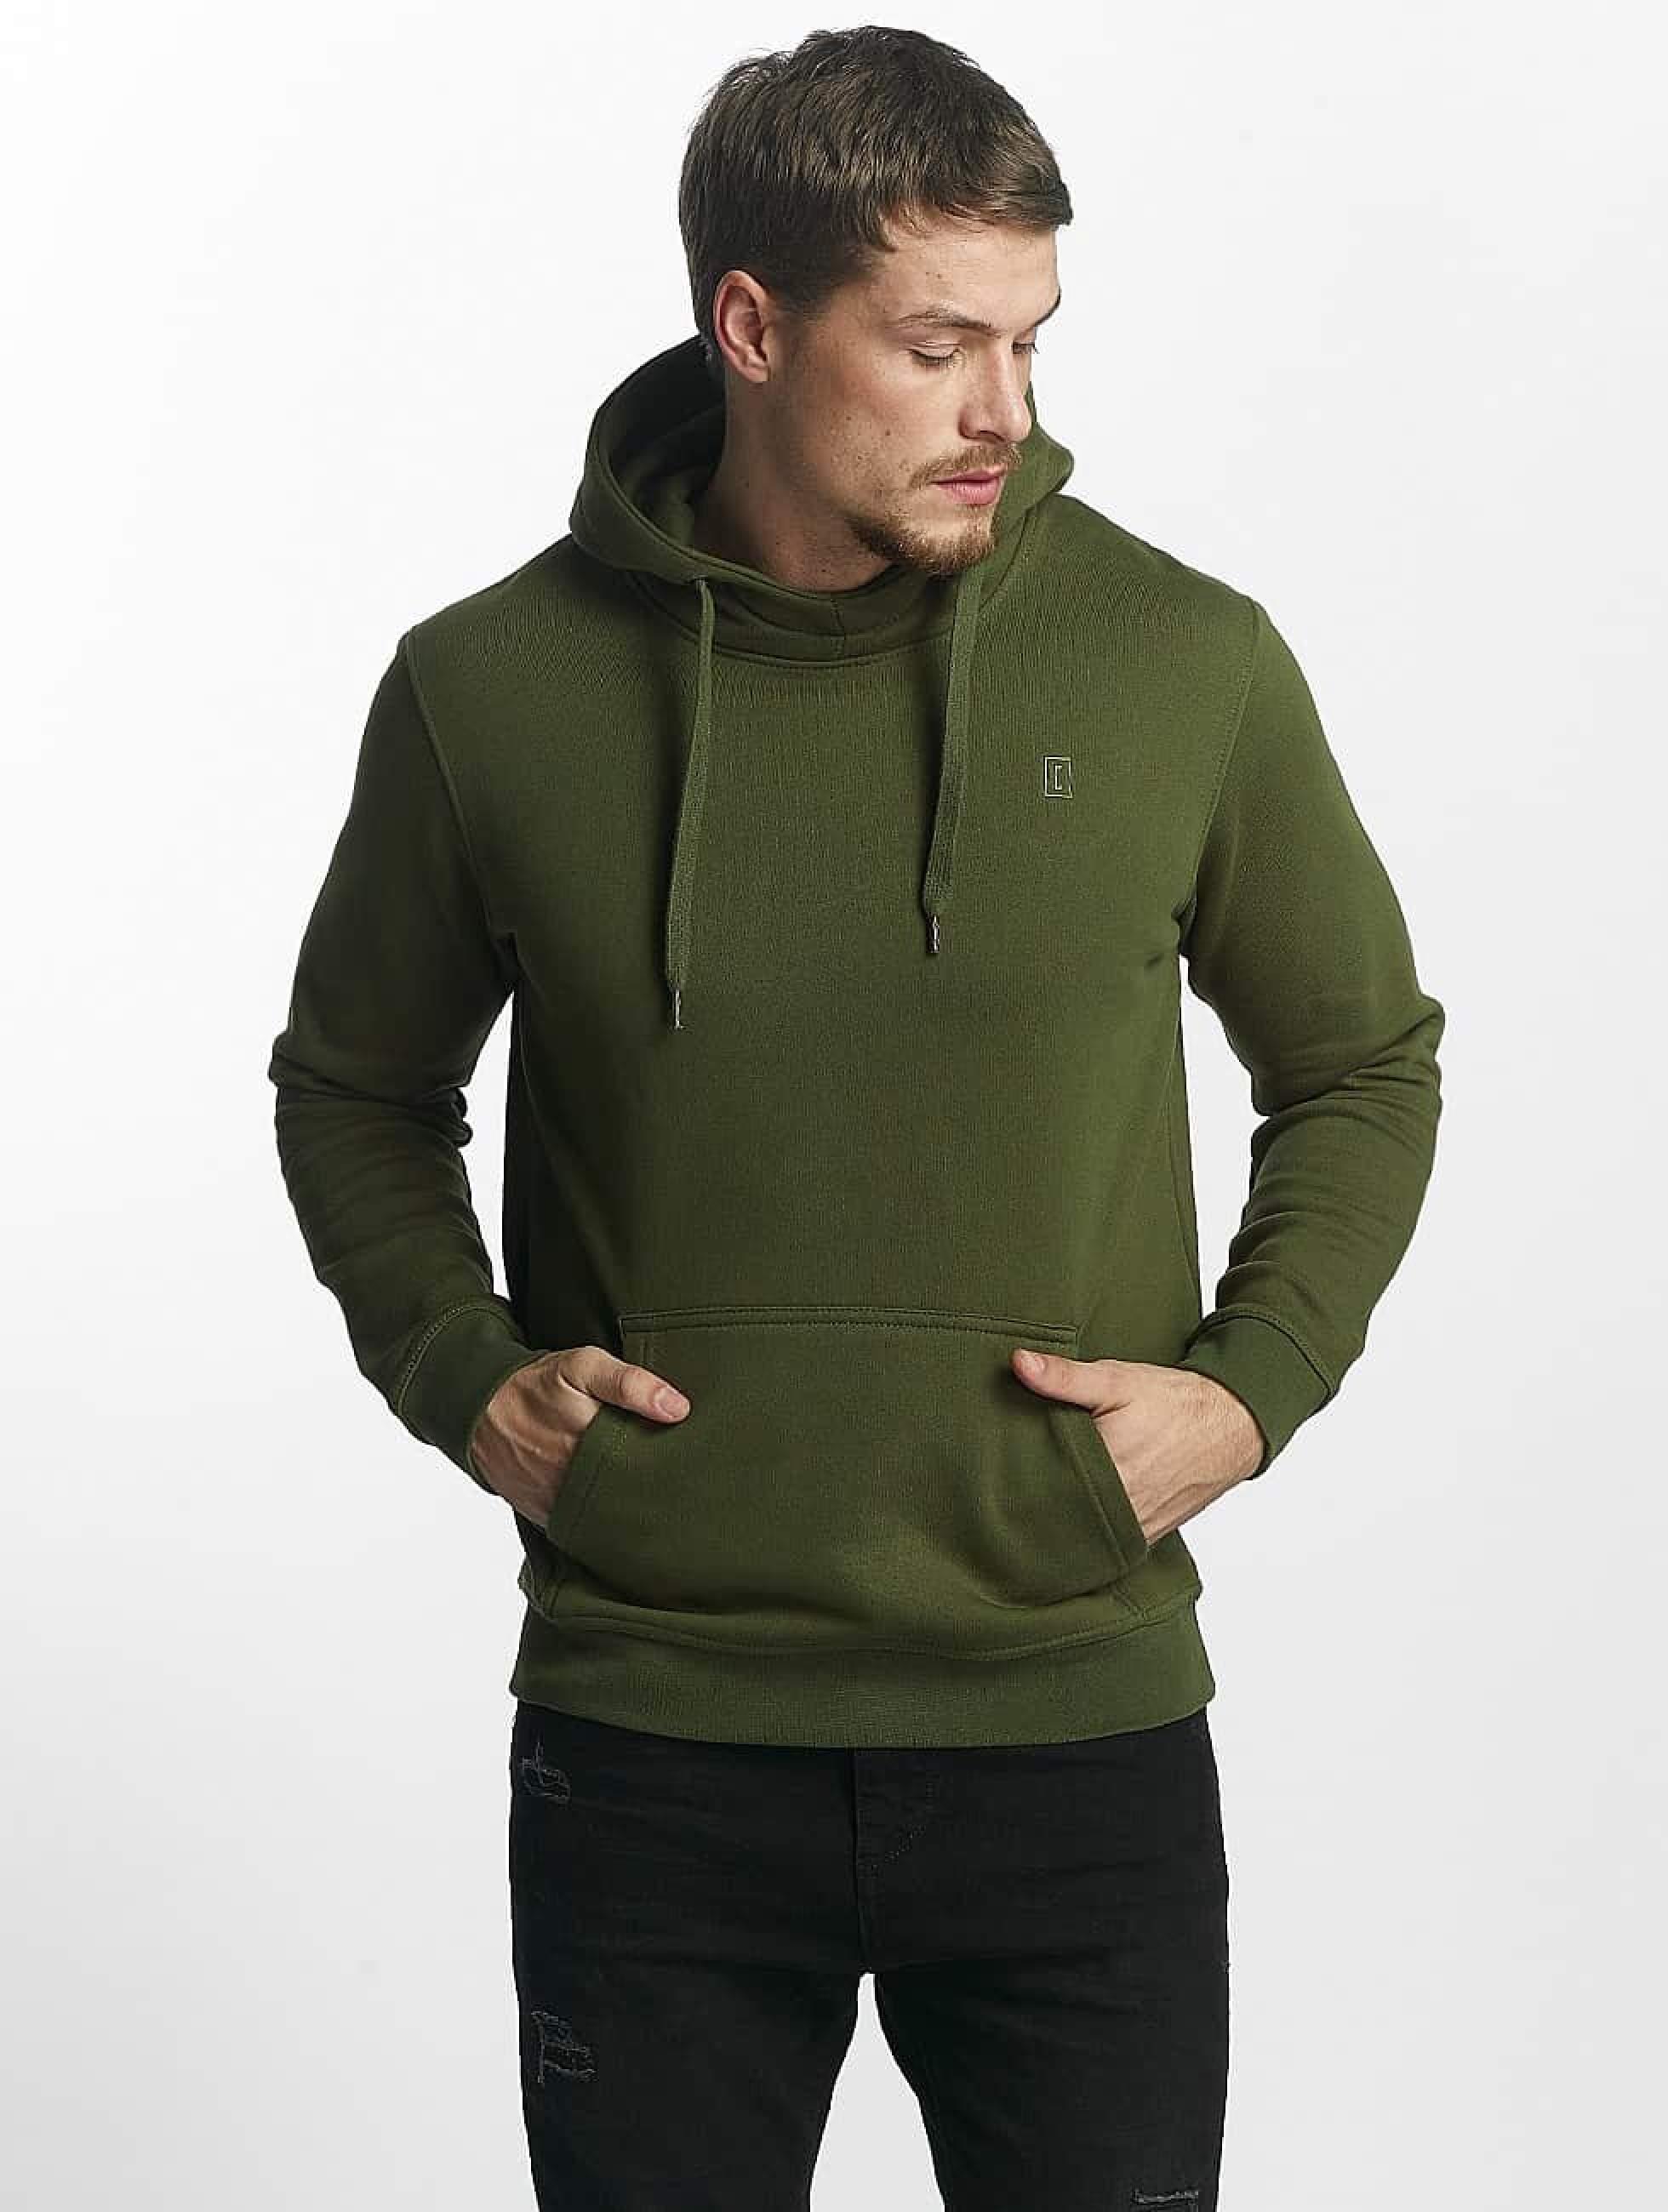 Cyprime / Hoodie Titanium in green 3XL